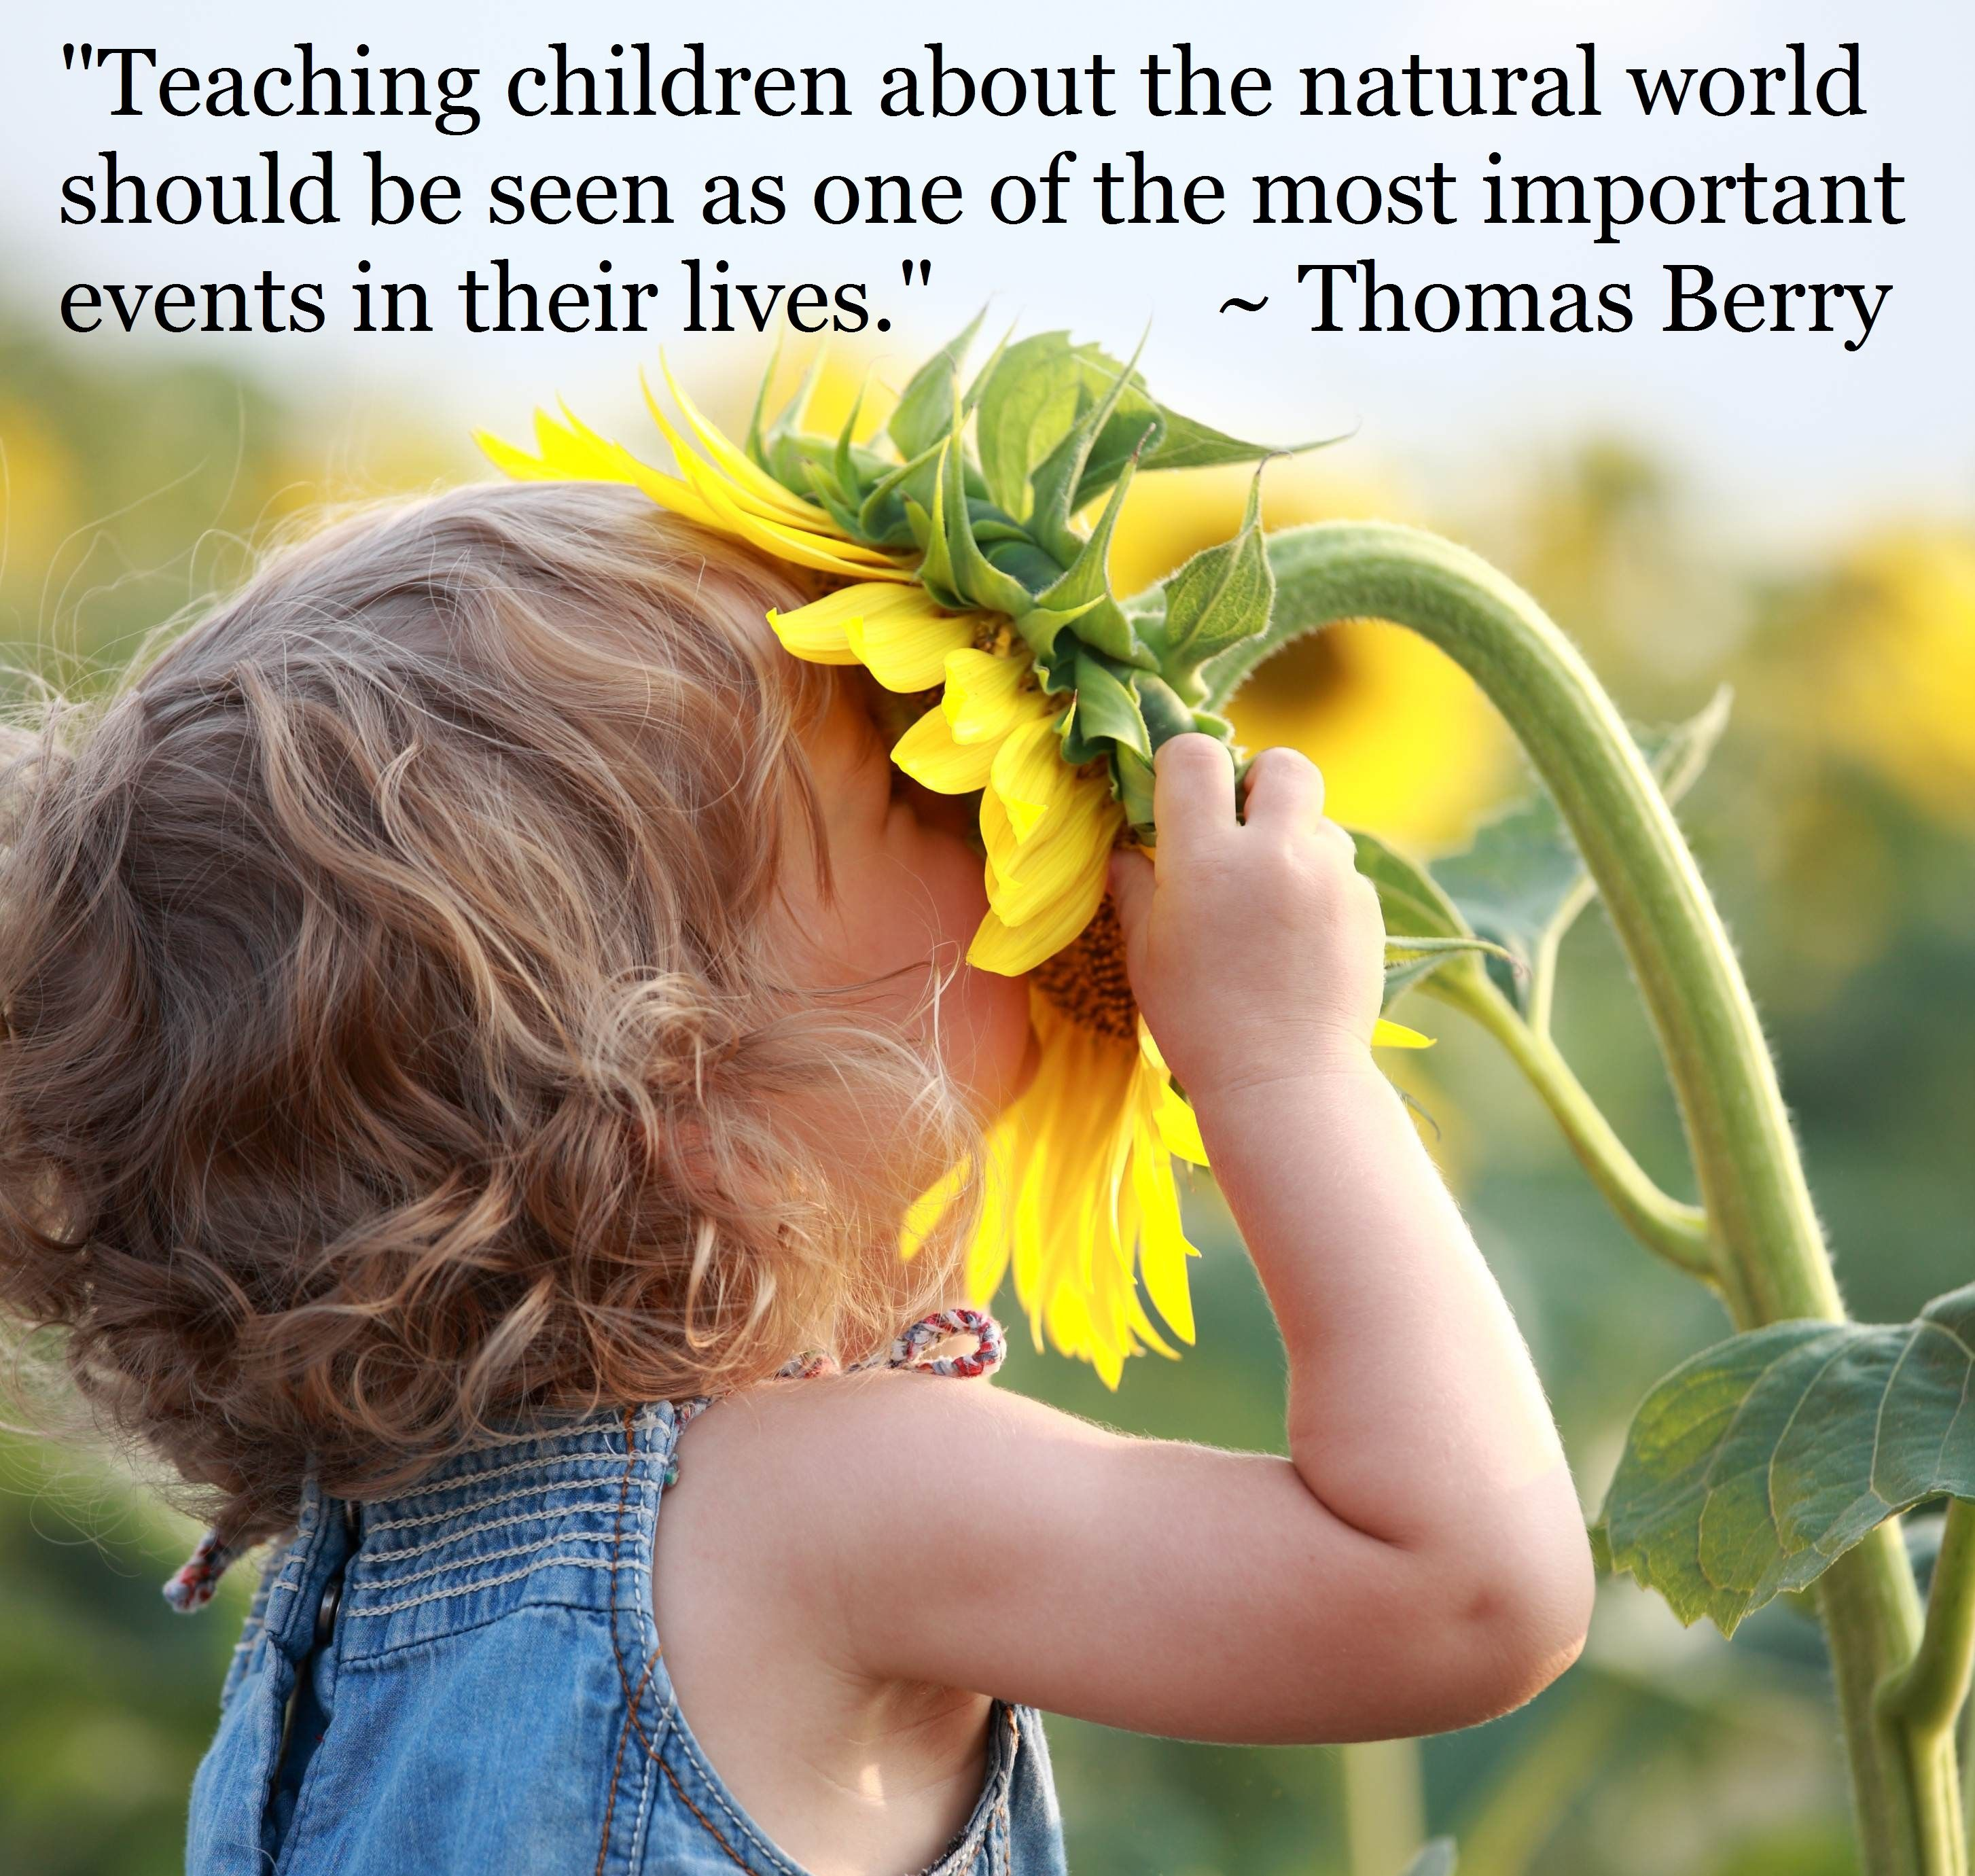 lifelong learning surviving natural